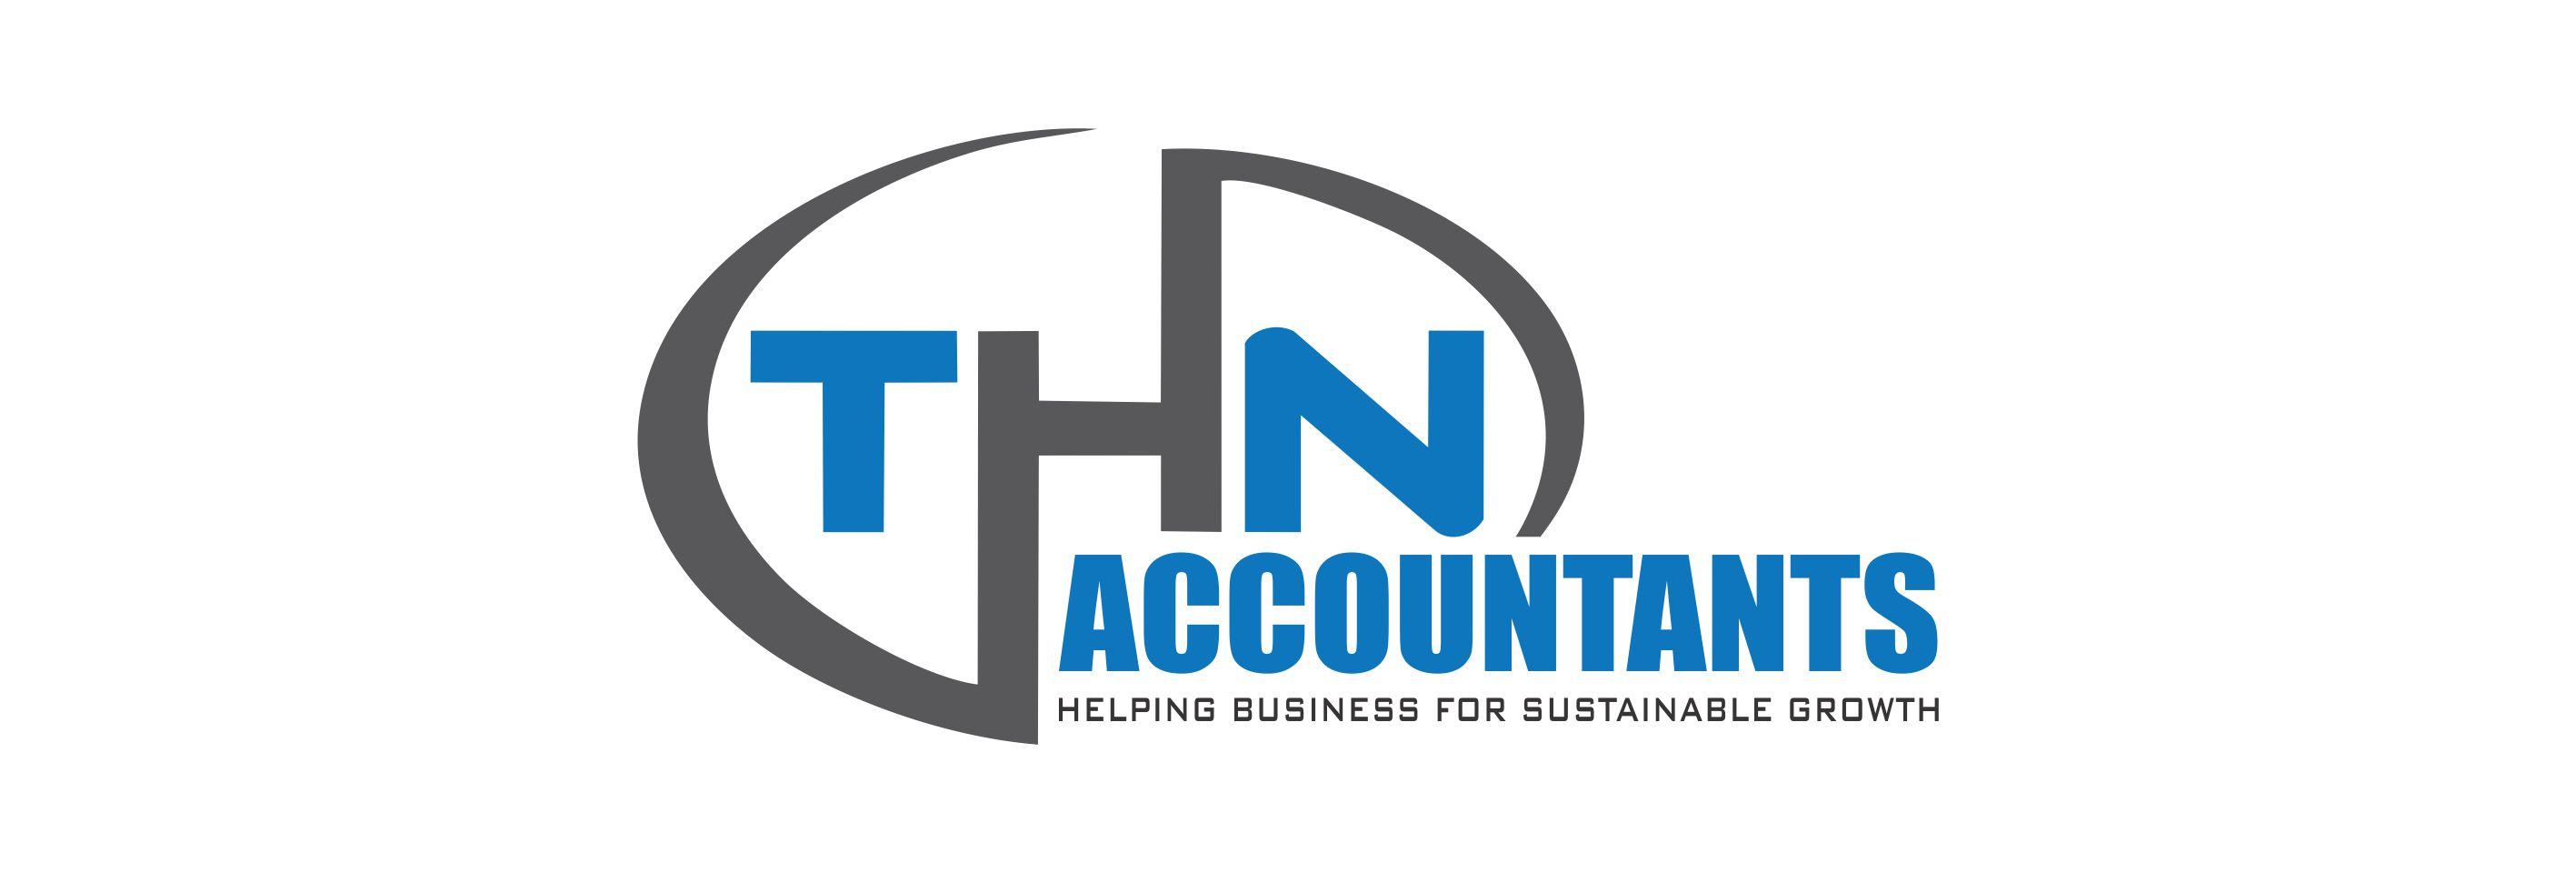 THN Accountants.jpg